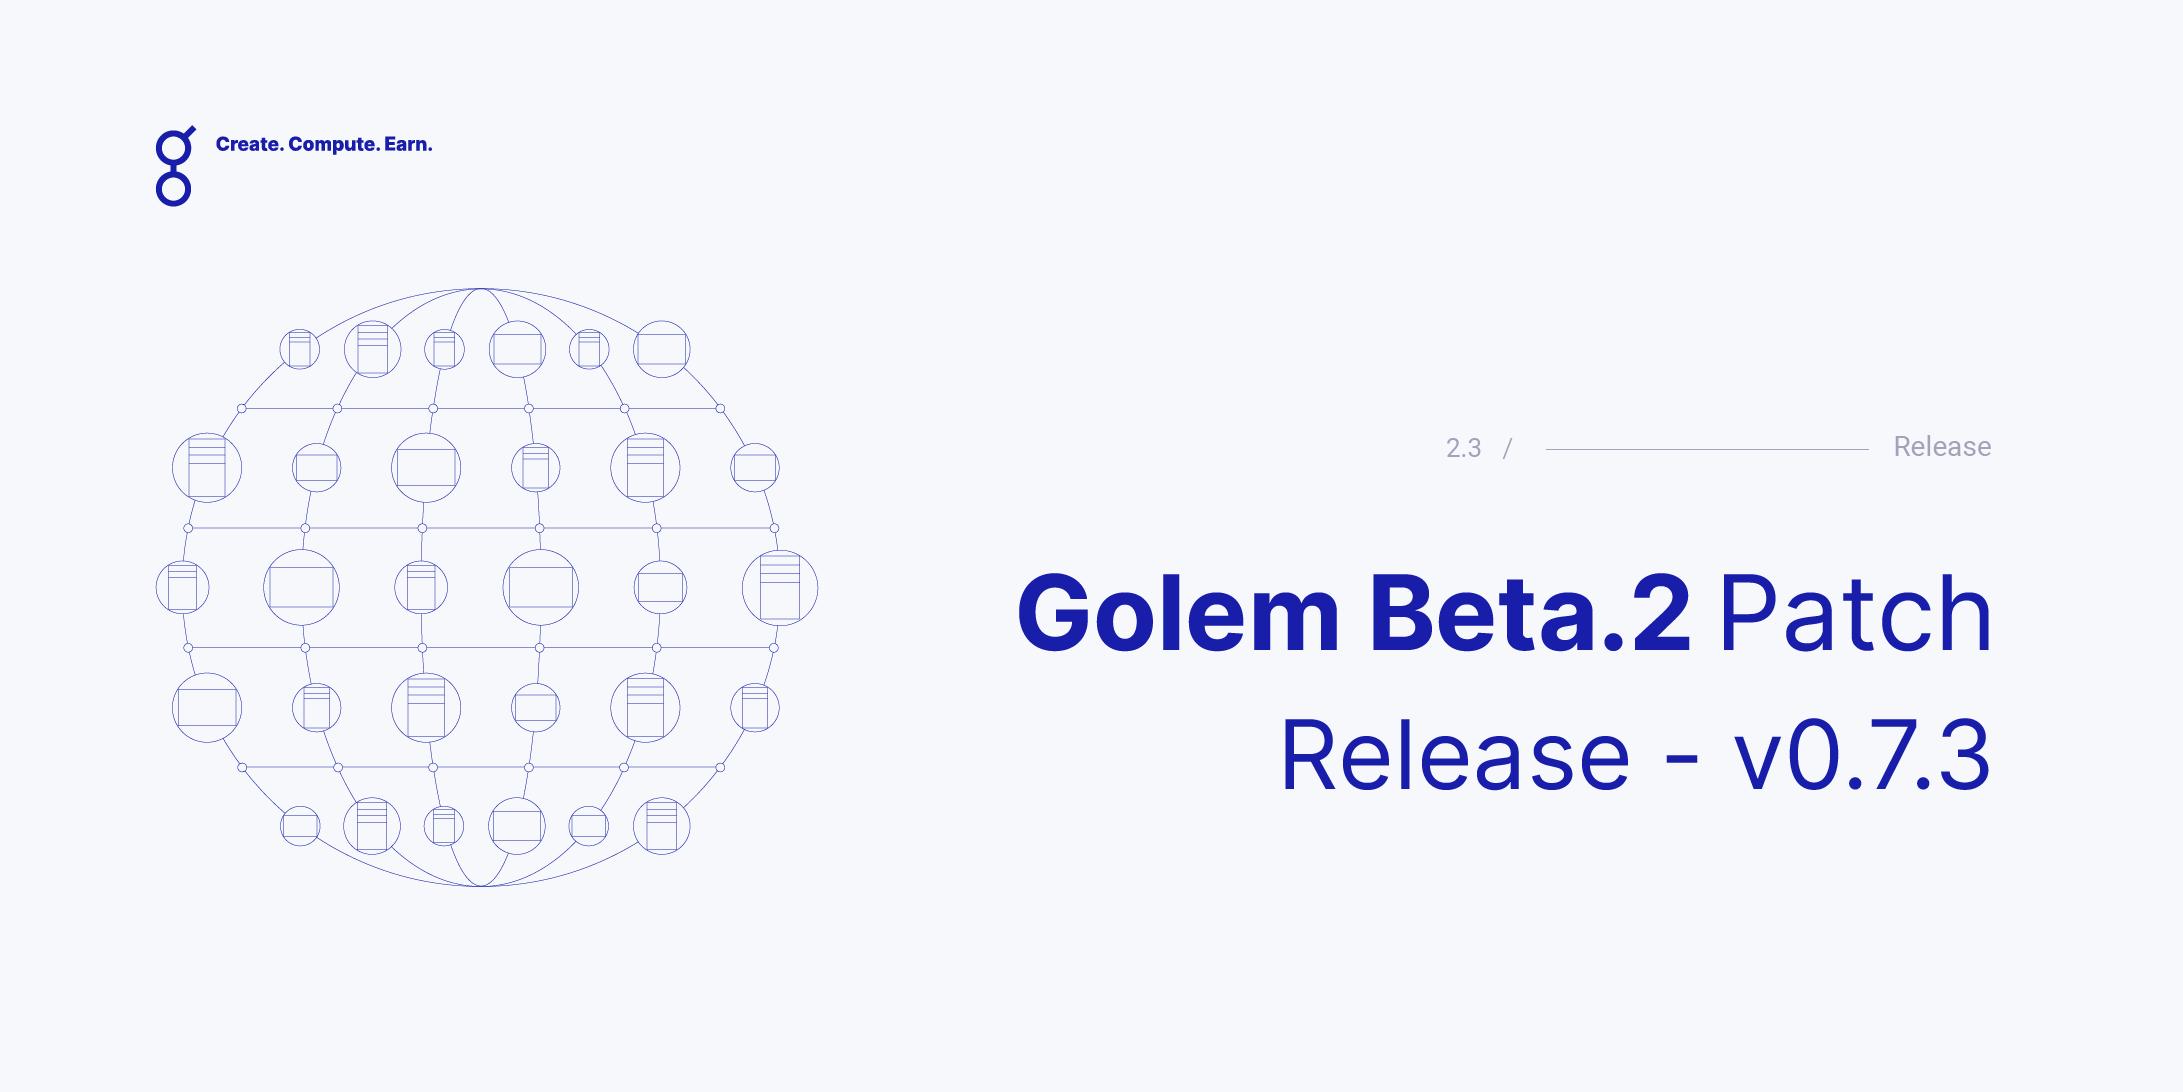 Golem Beta 2 Patch Release - v0.7.3